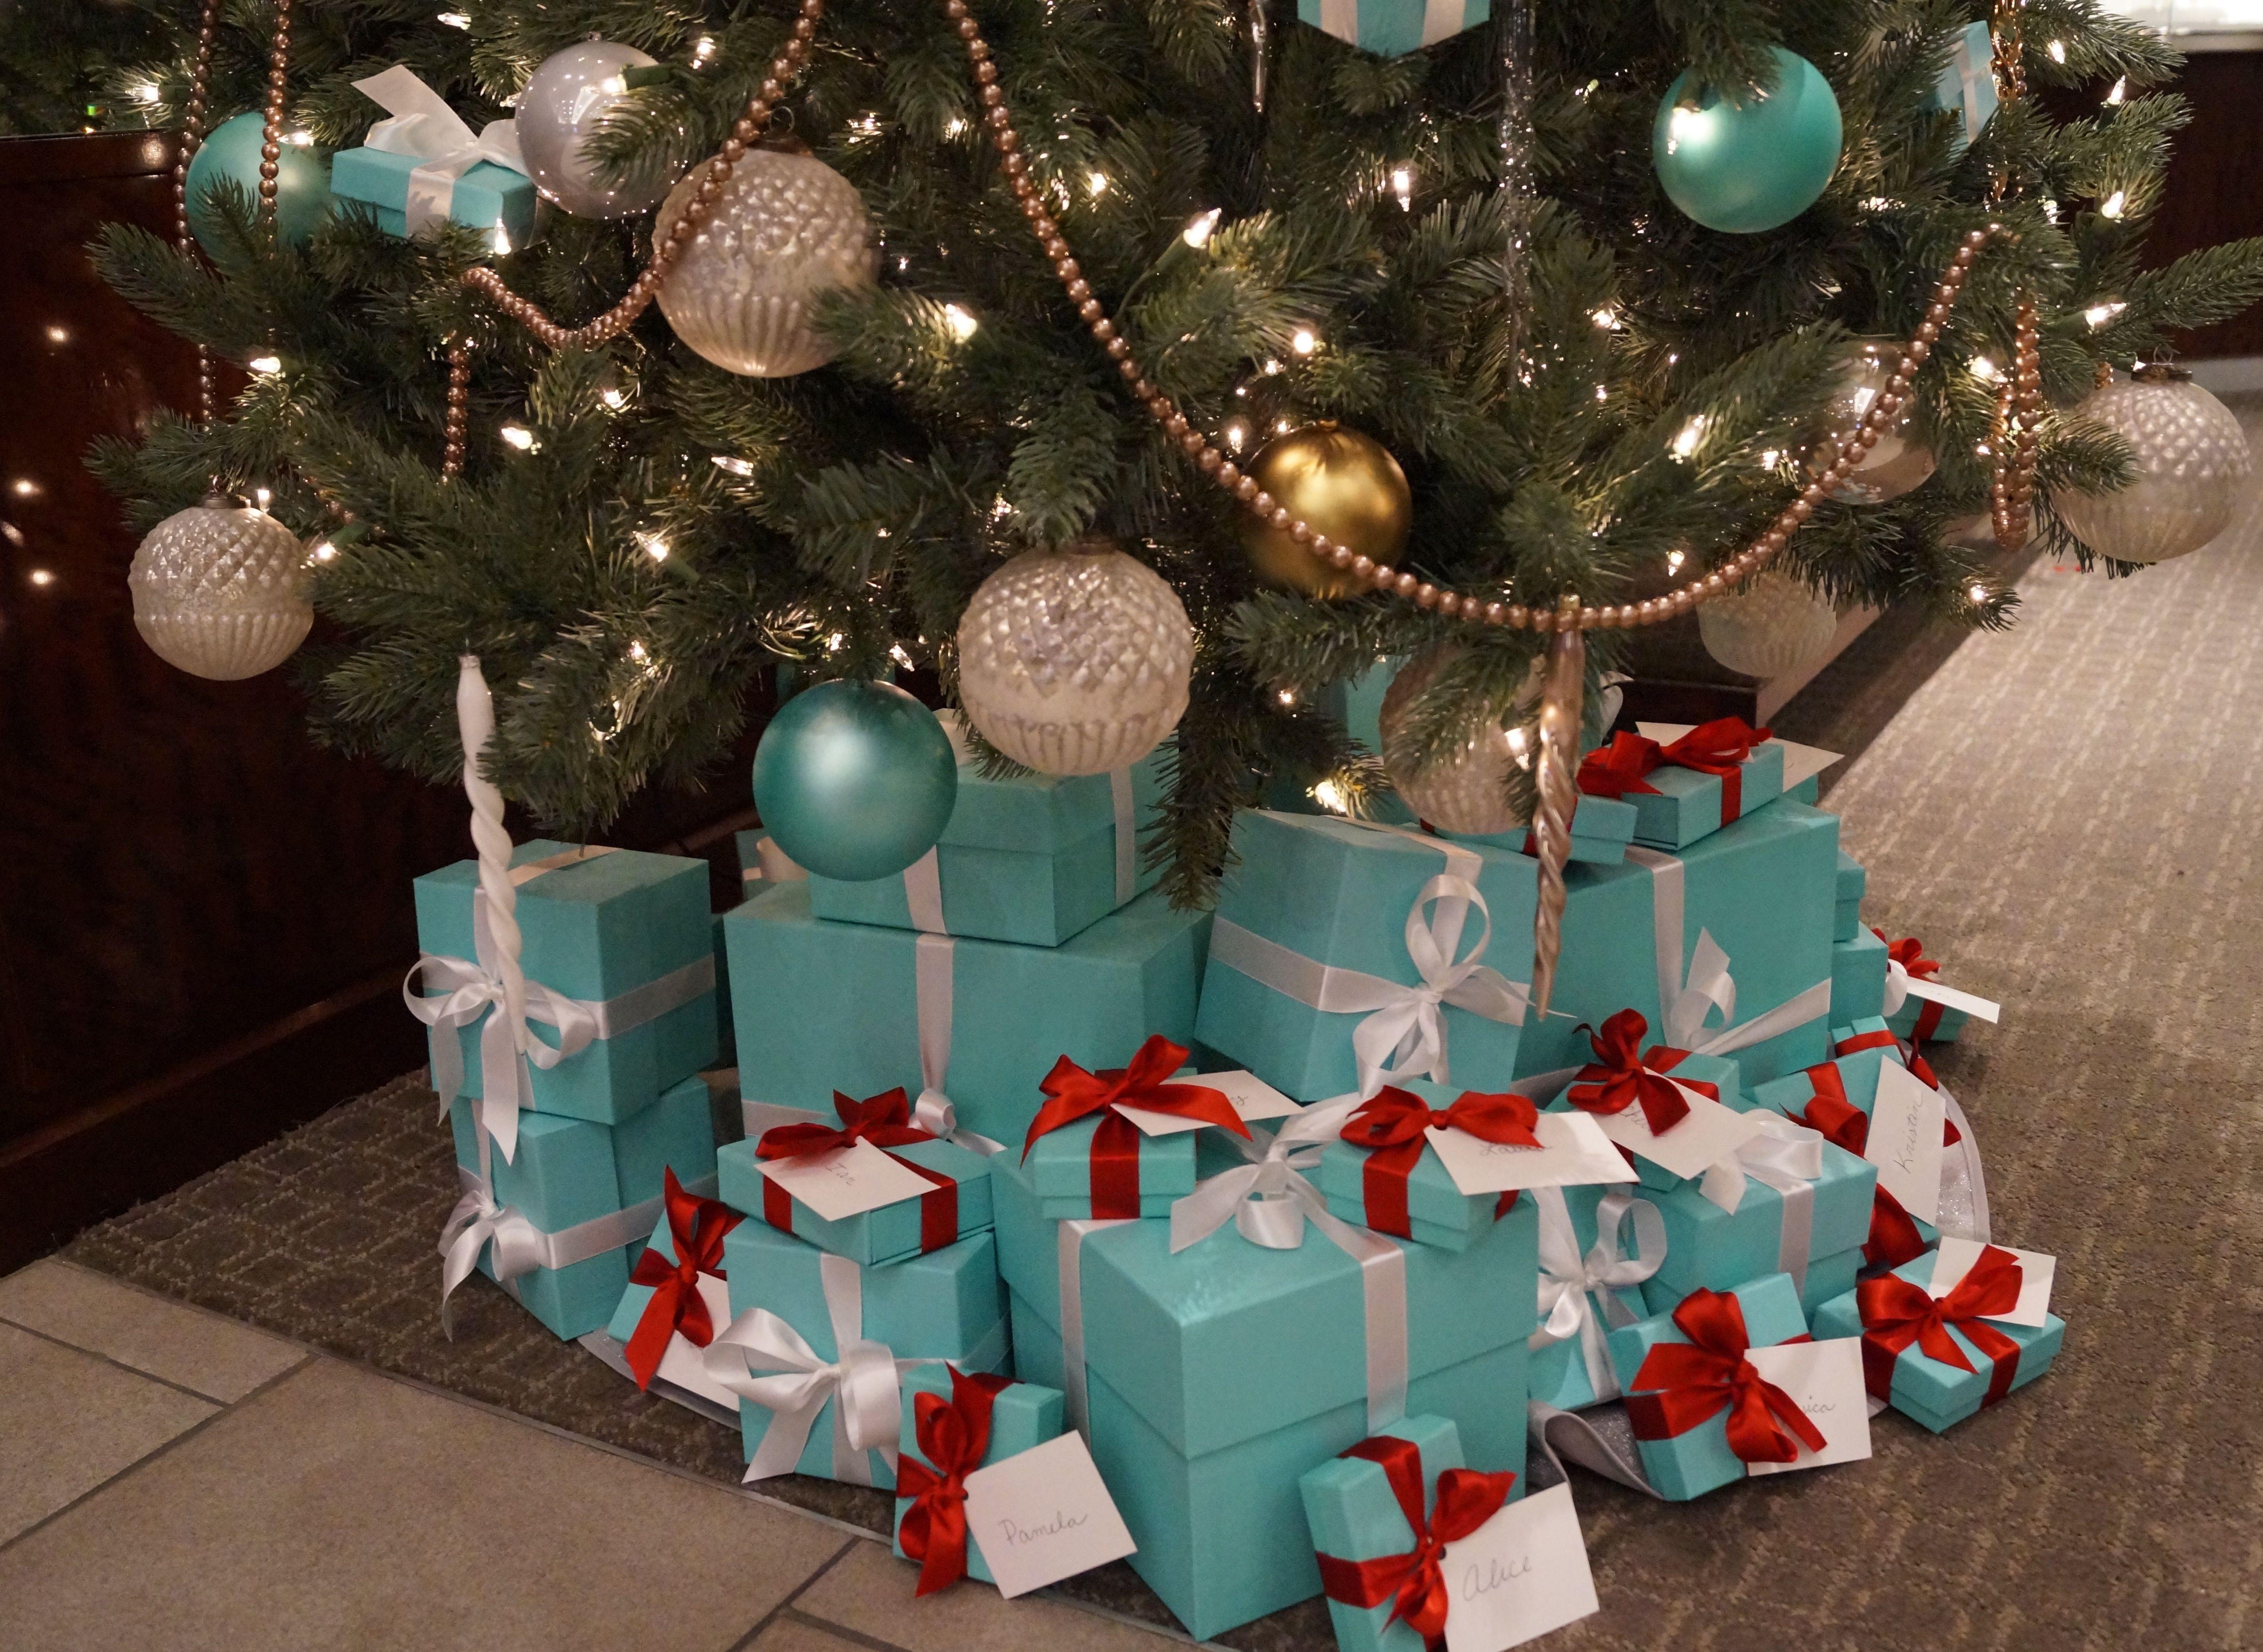 Tiffany and Co Christmas tree | Christmas Joy | Pinterest